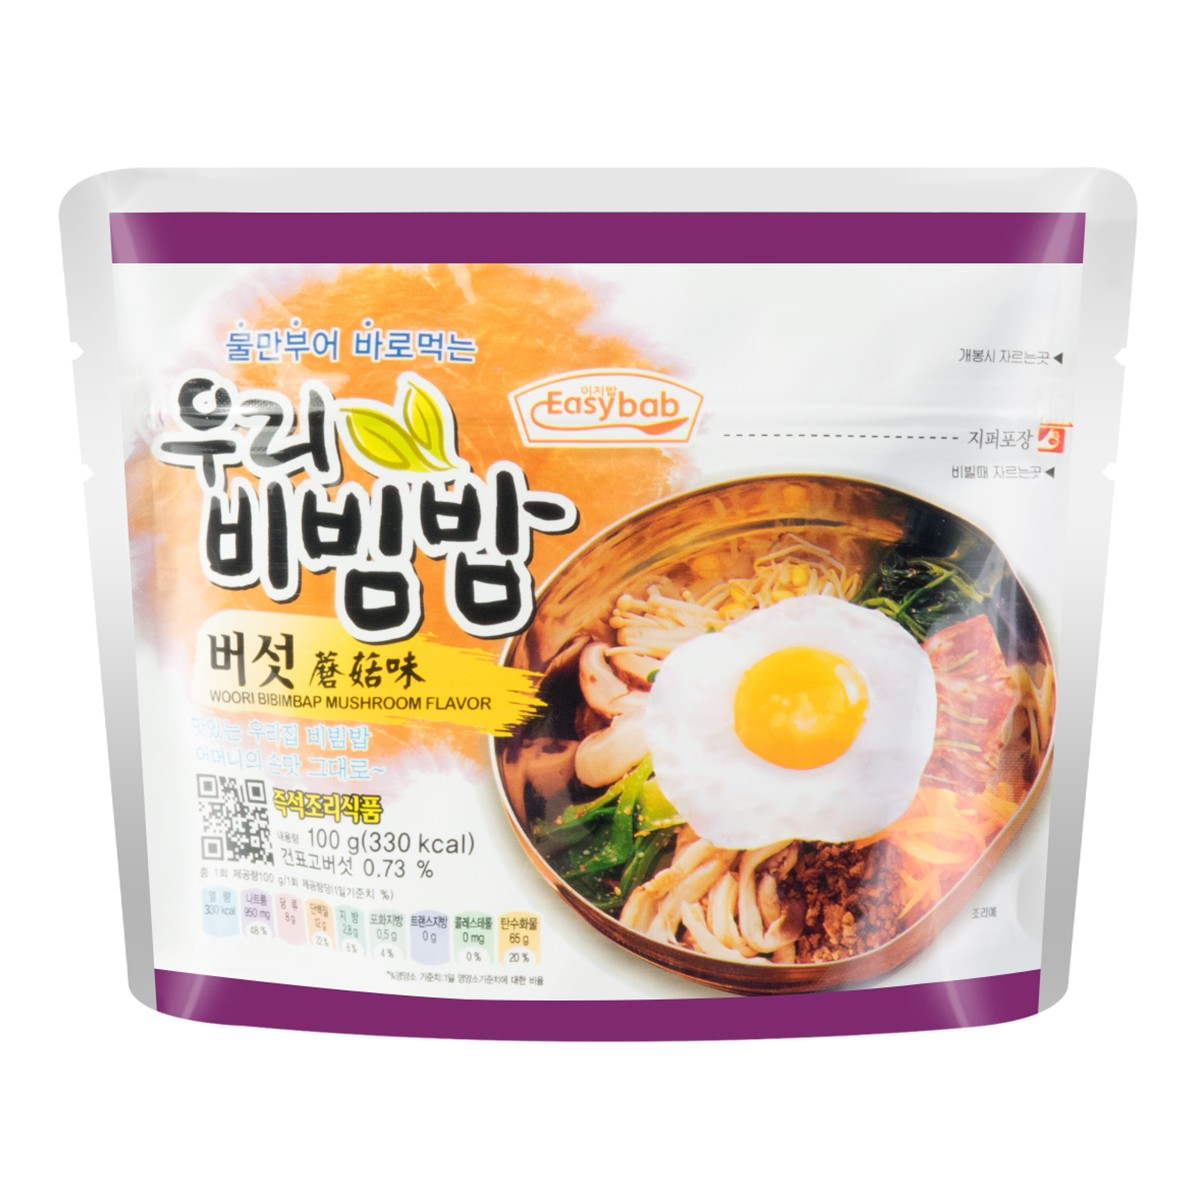 EASYBAB Rice With Vegetbale W Mushroom 100g